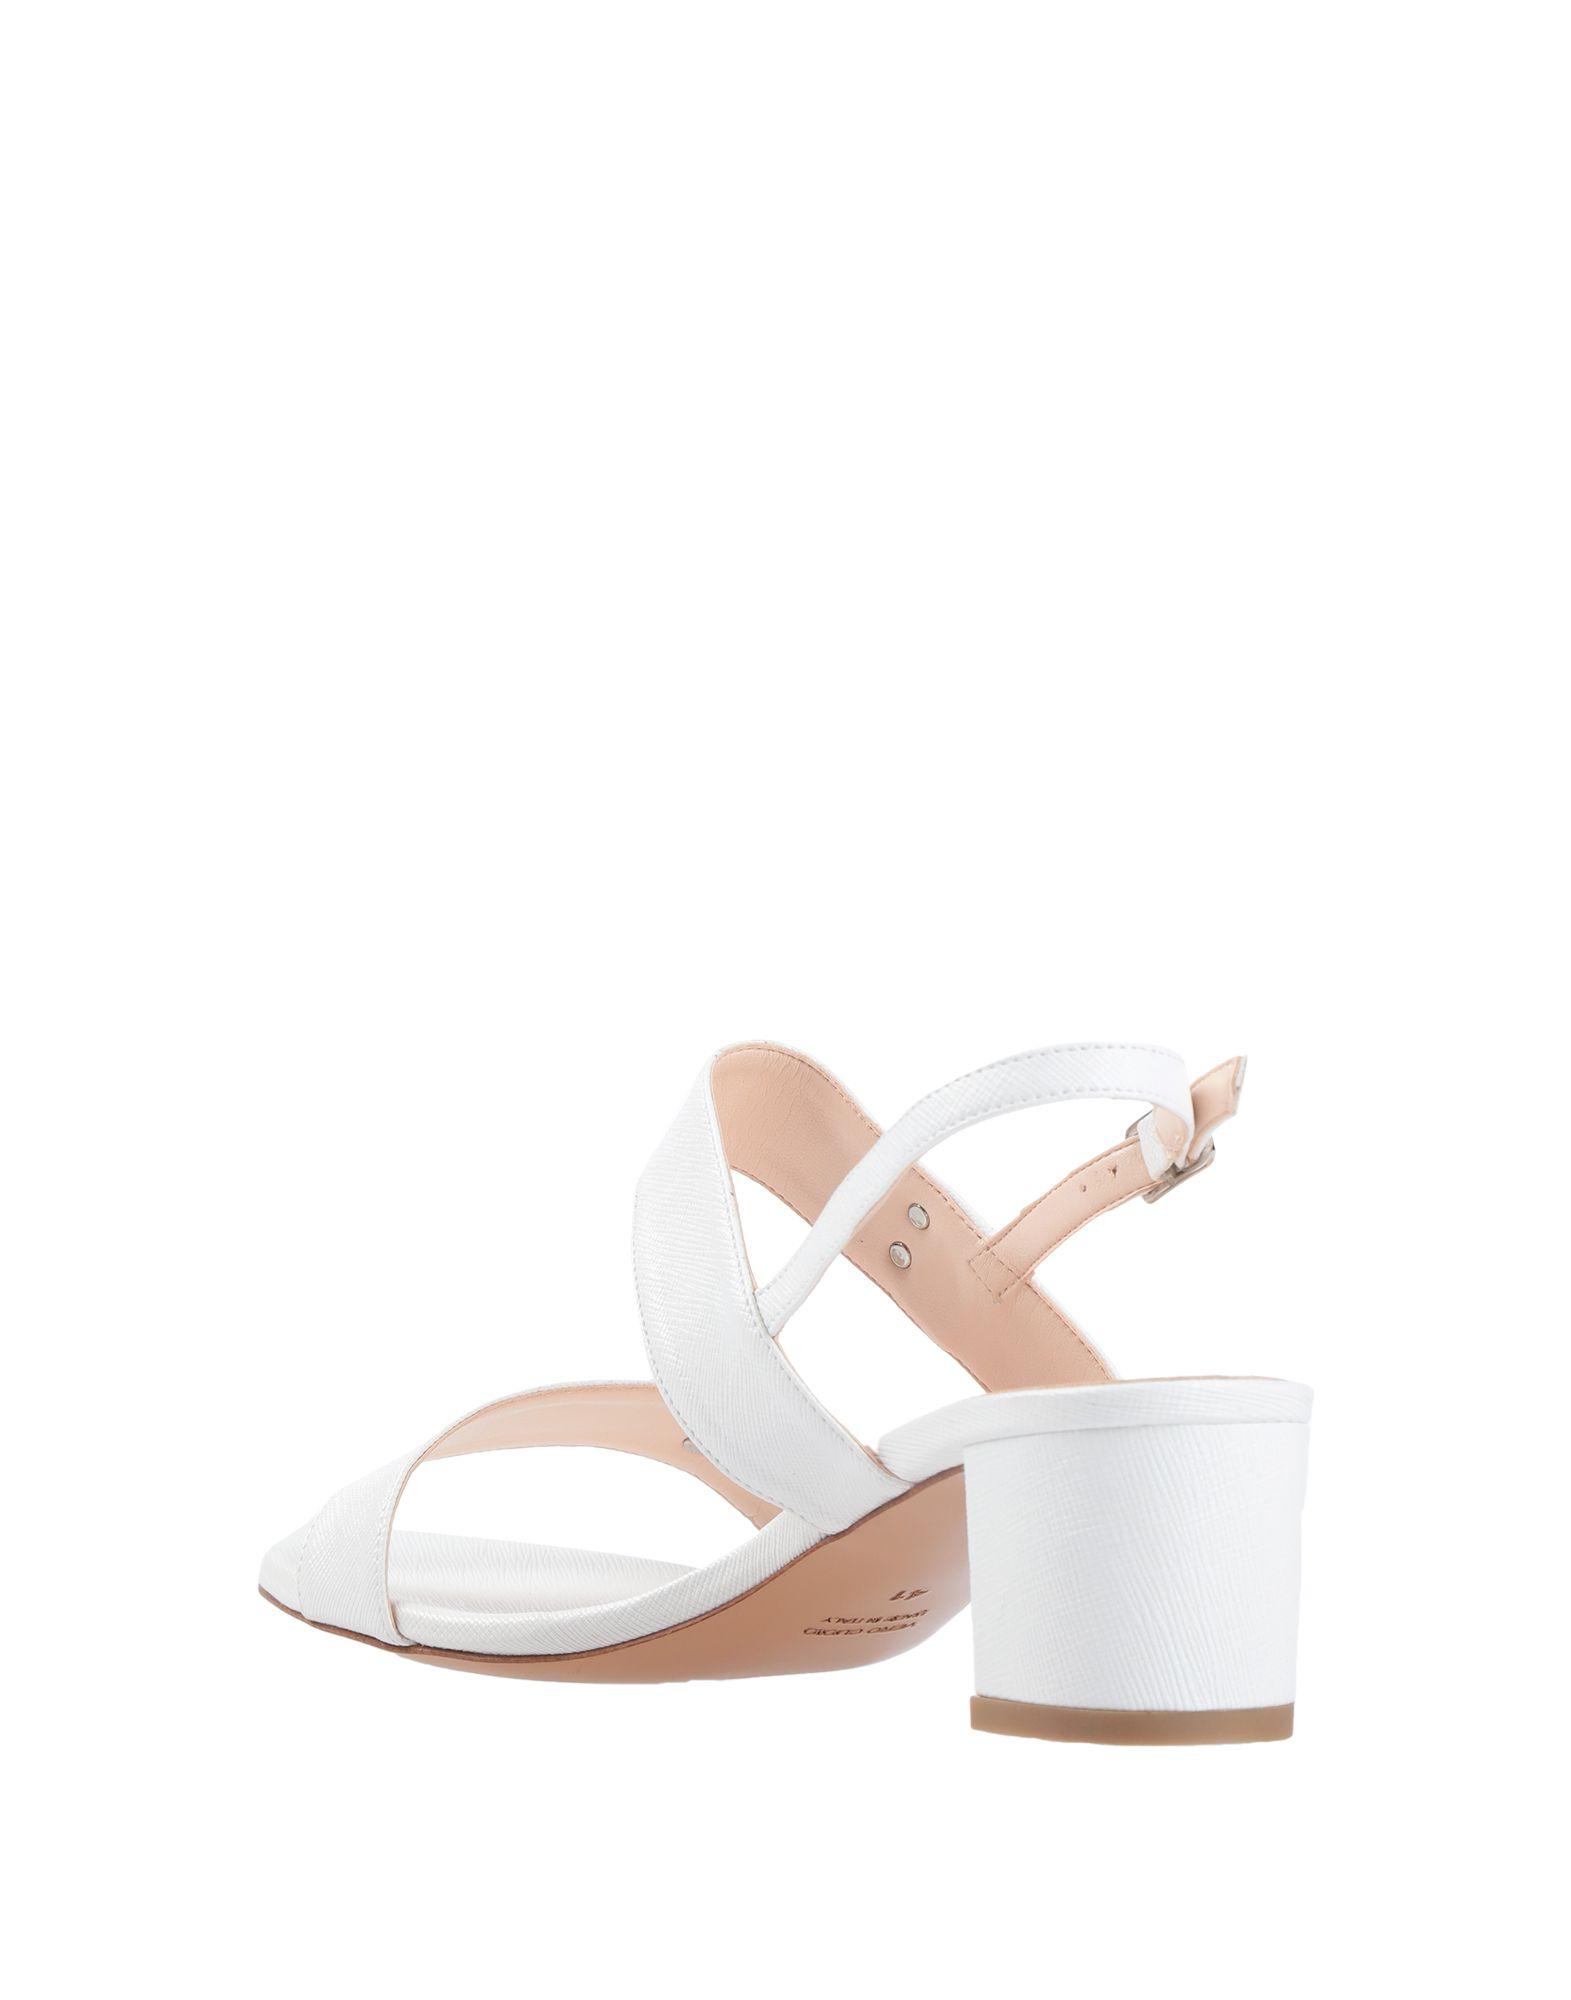 L amour Gute Sandalen Damen 11532234LC Gute amour Qualität beliebte Schuhe ebc6e8